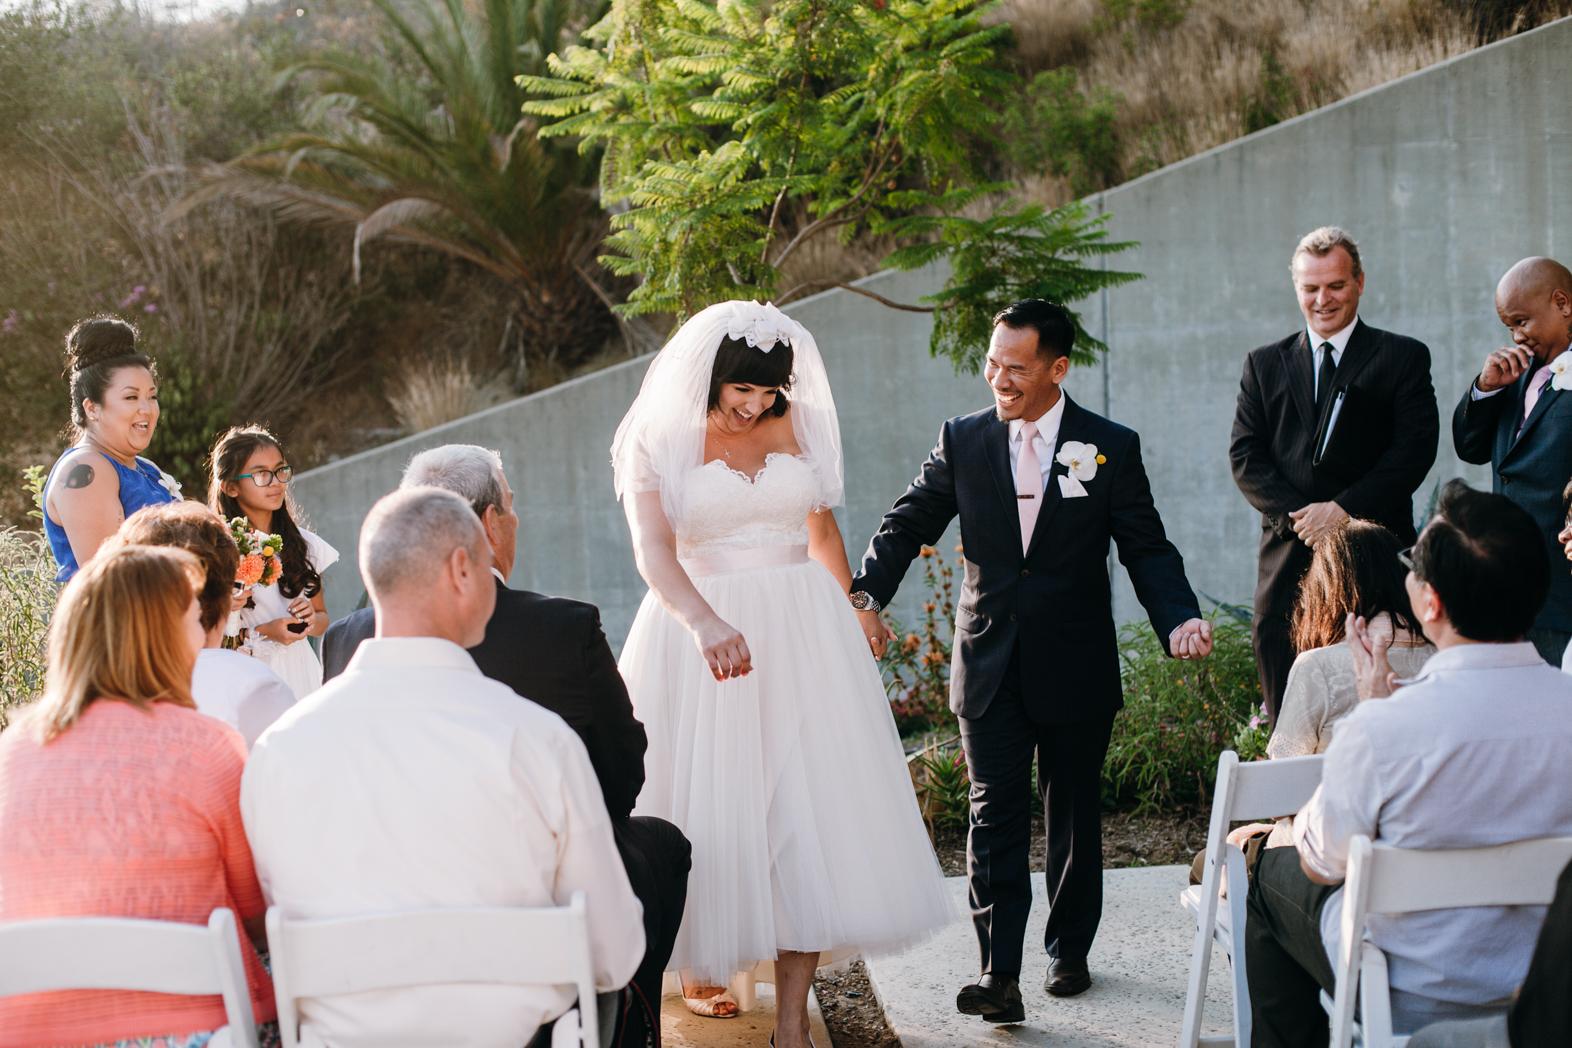 KaraNixonWeddings-LosAngeles-Wedding-14.jpg